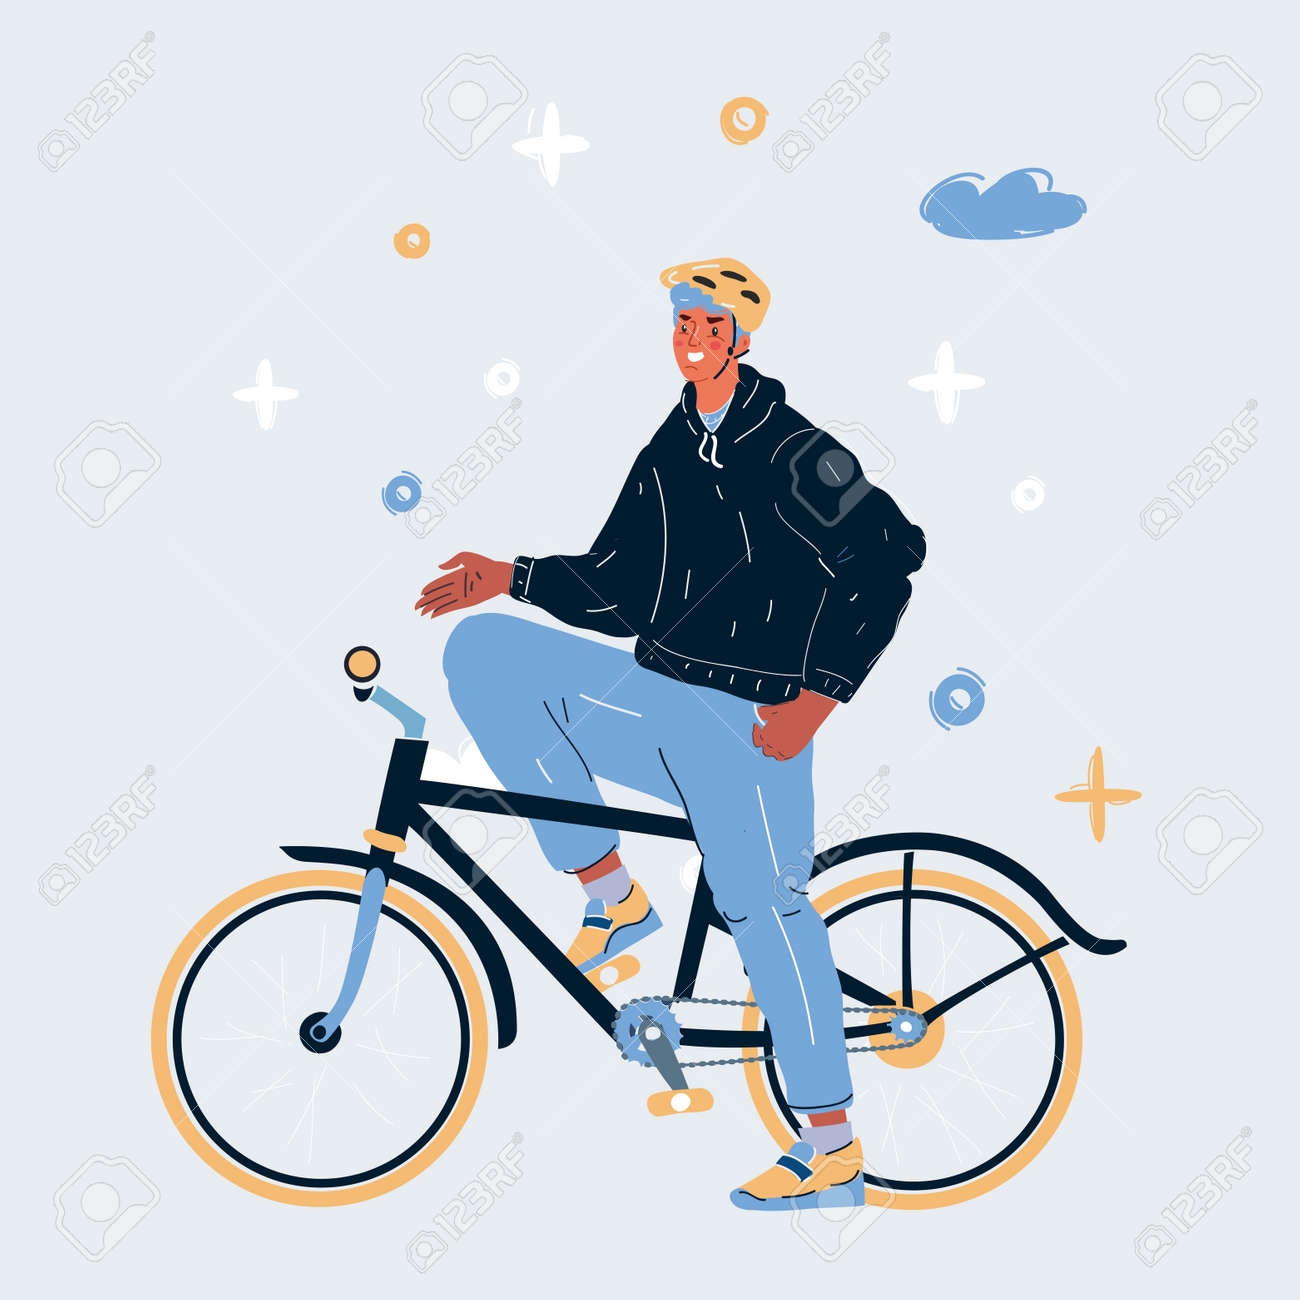 Vector illustration of man on a bike - 167734503